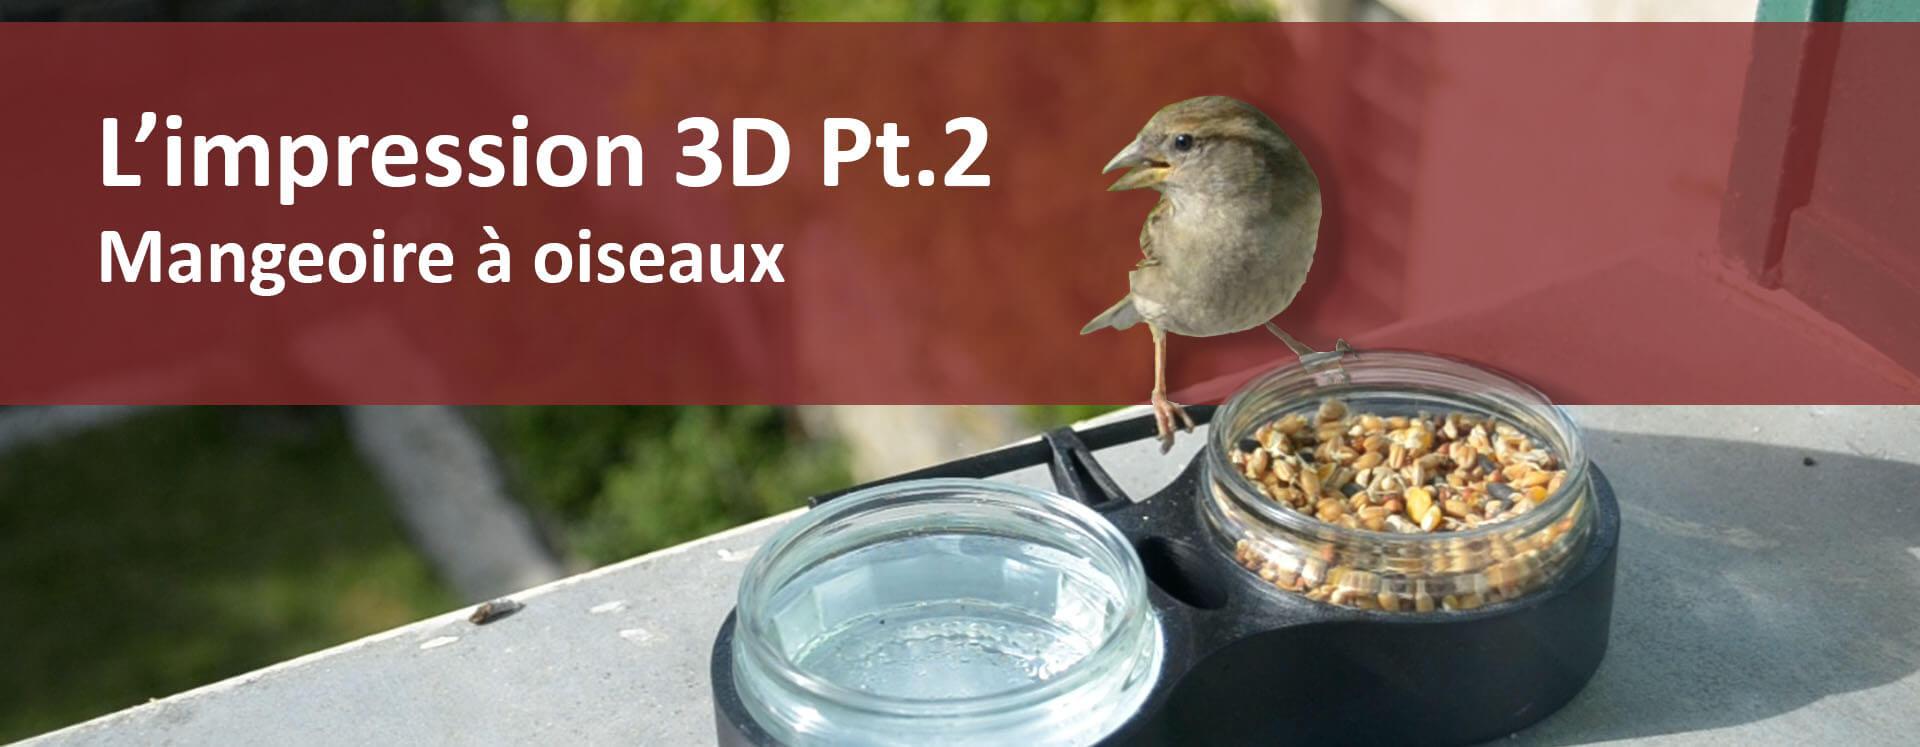 mangeoire oiseaux impression 3D